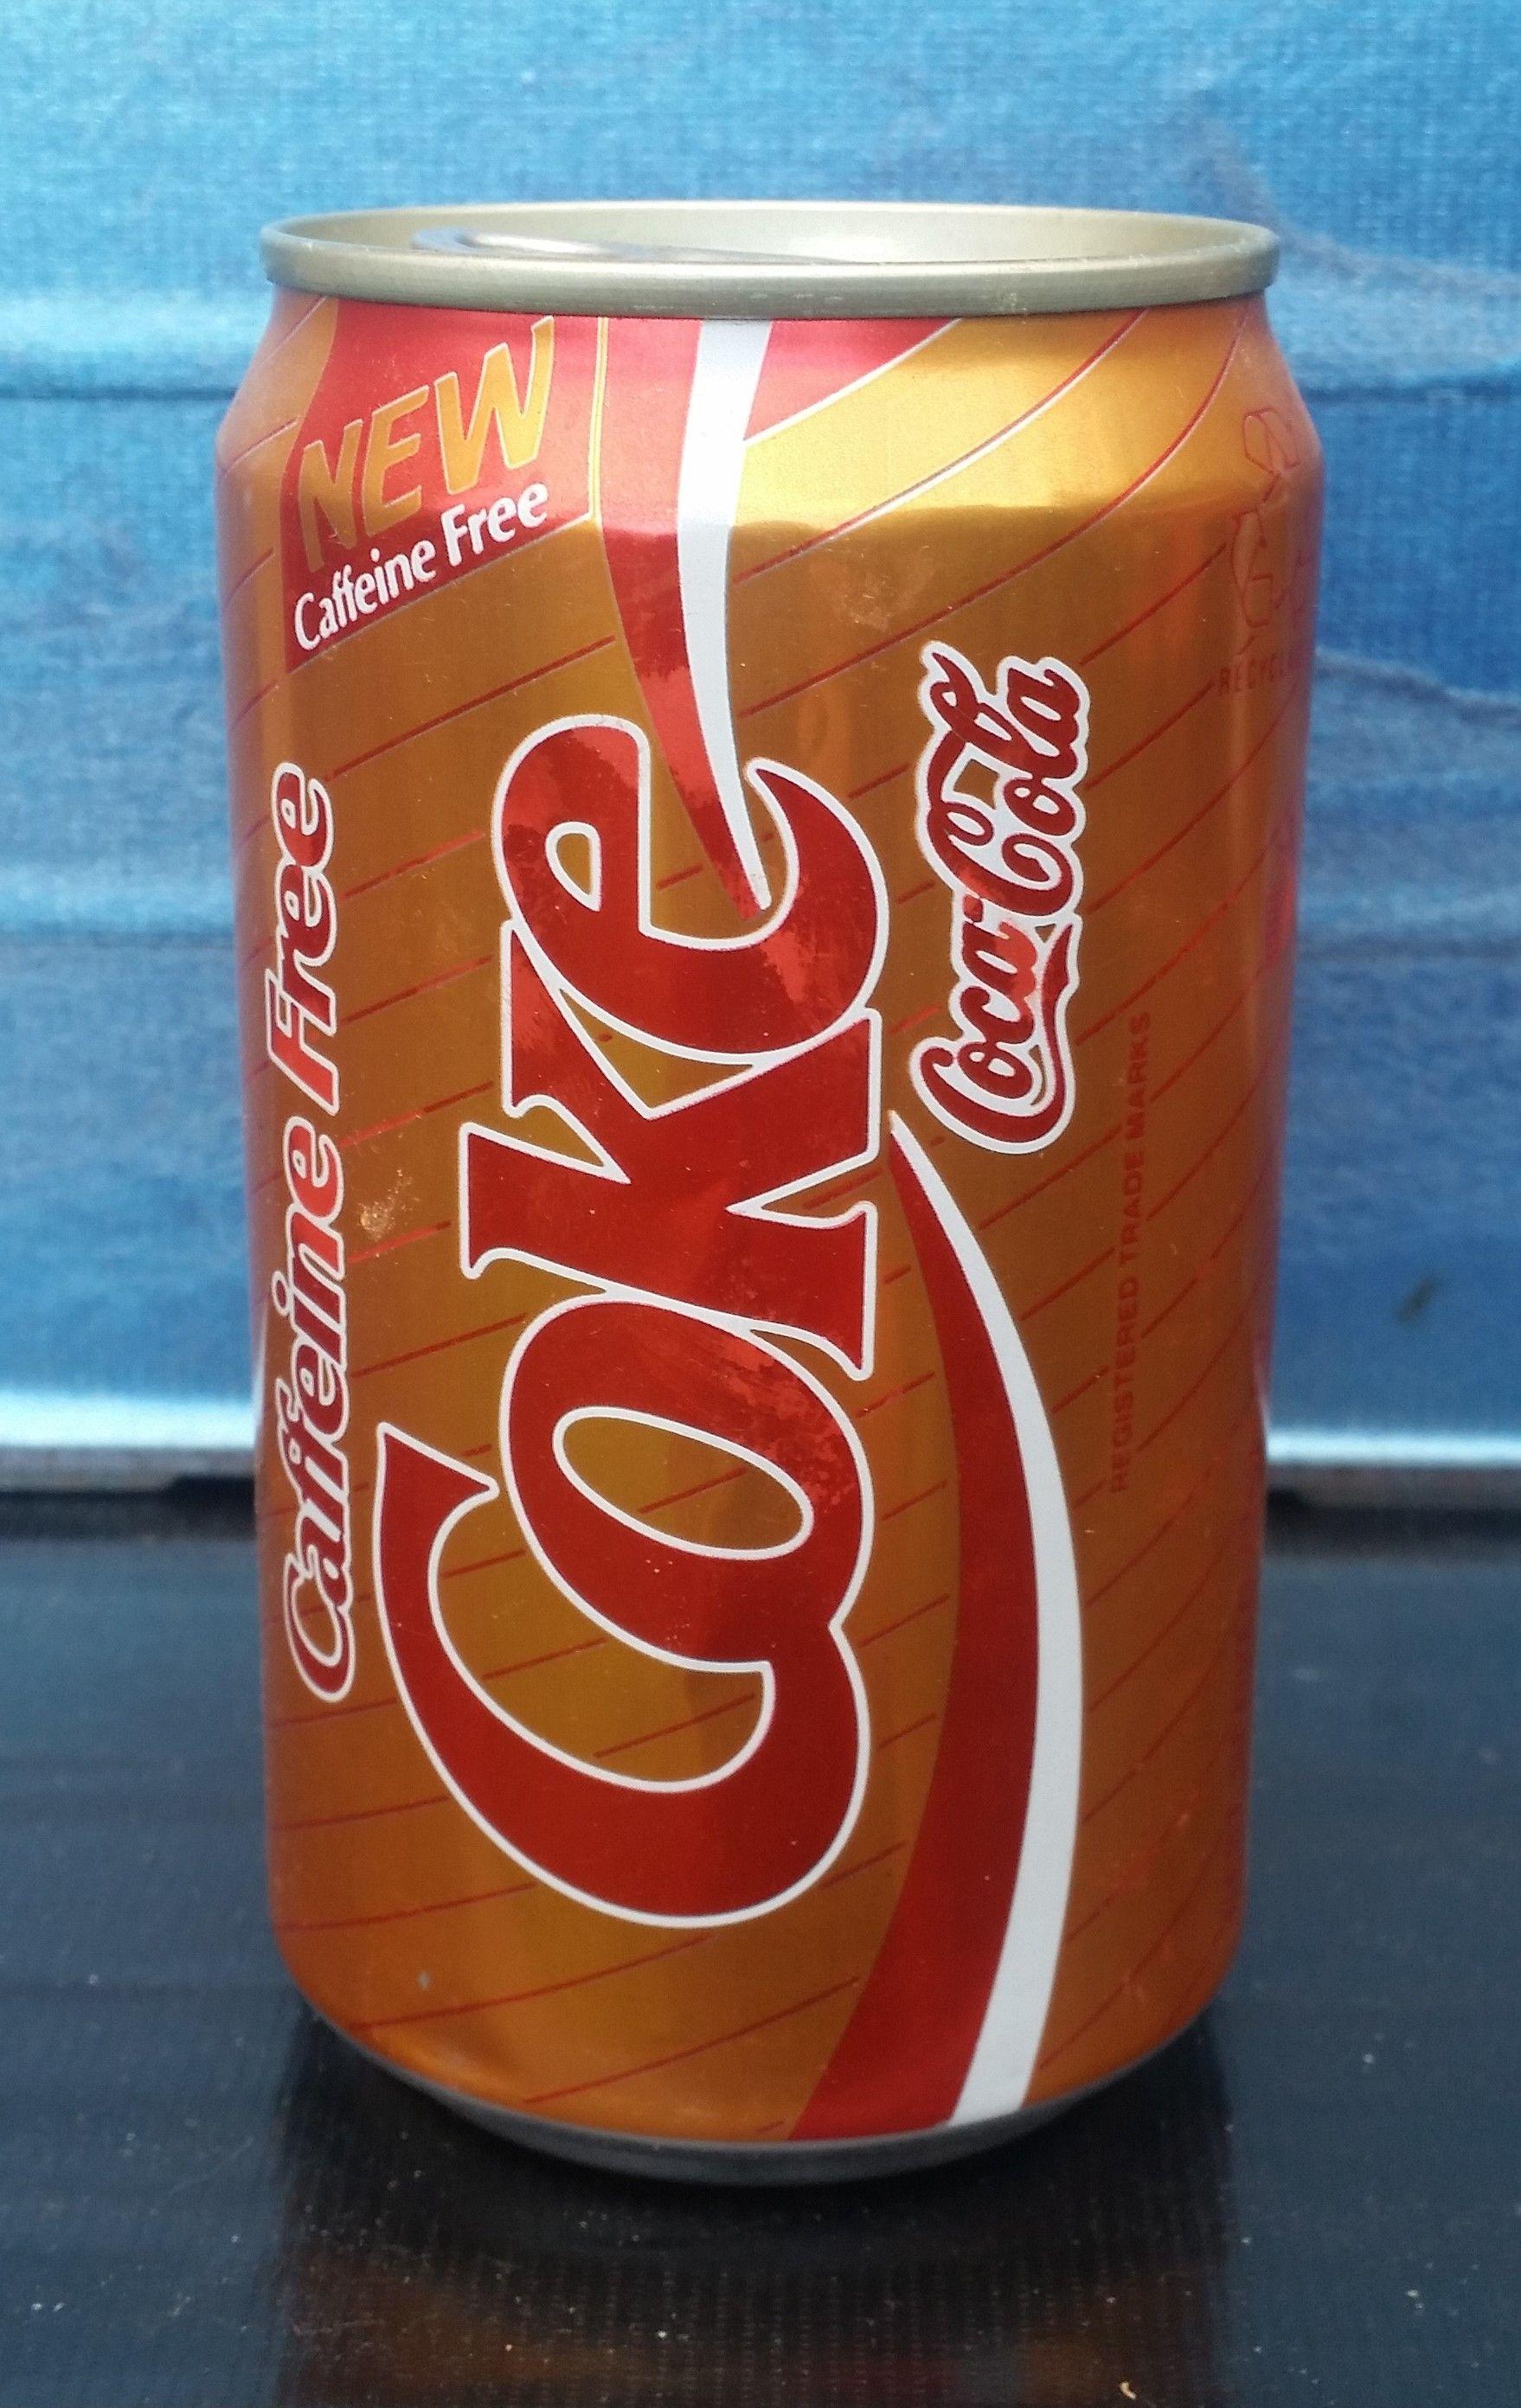 Park Art My WordPress Blog_Caffeine Free Dr Pepper Zero Sugar